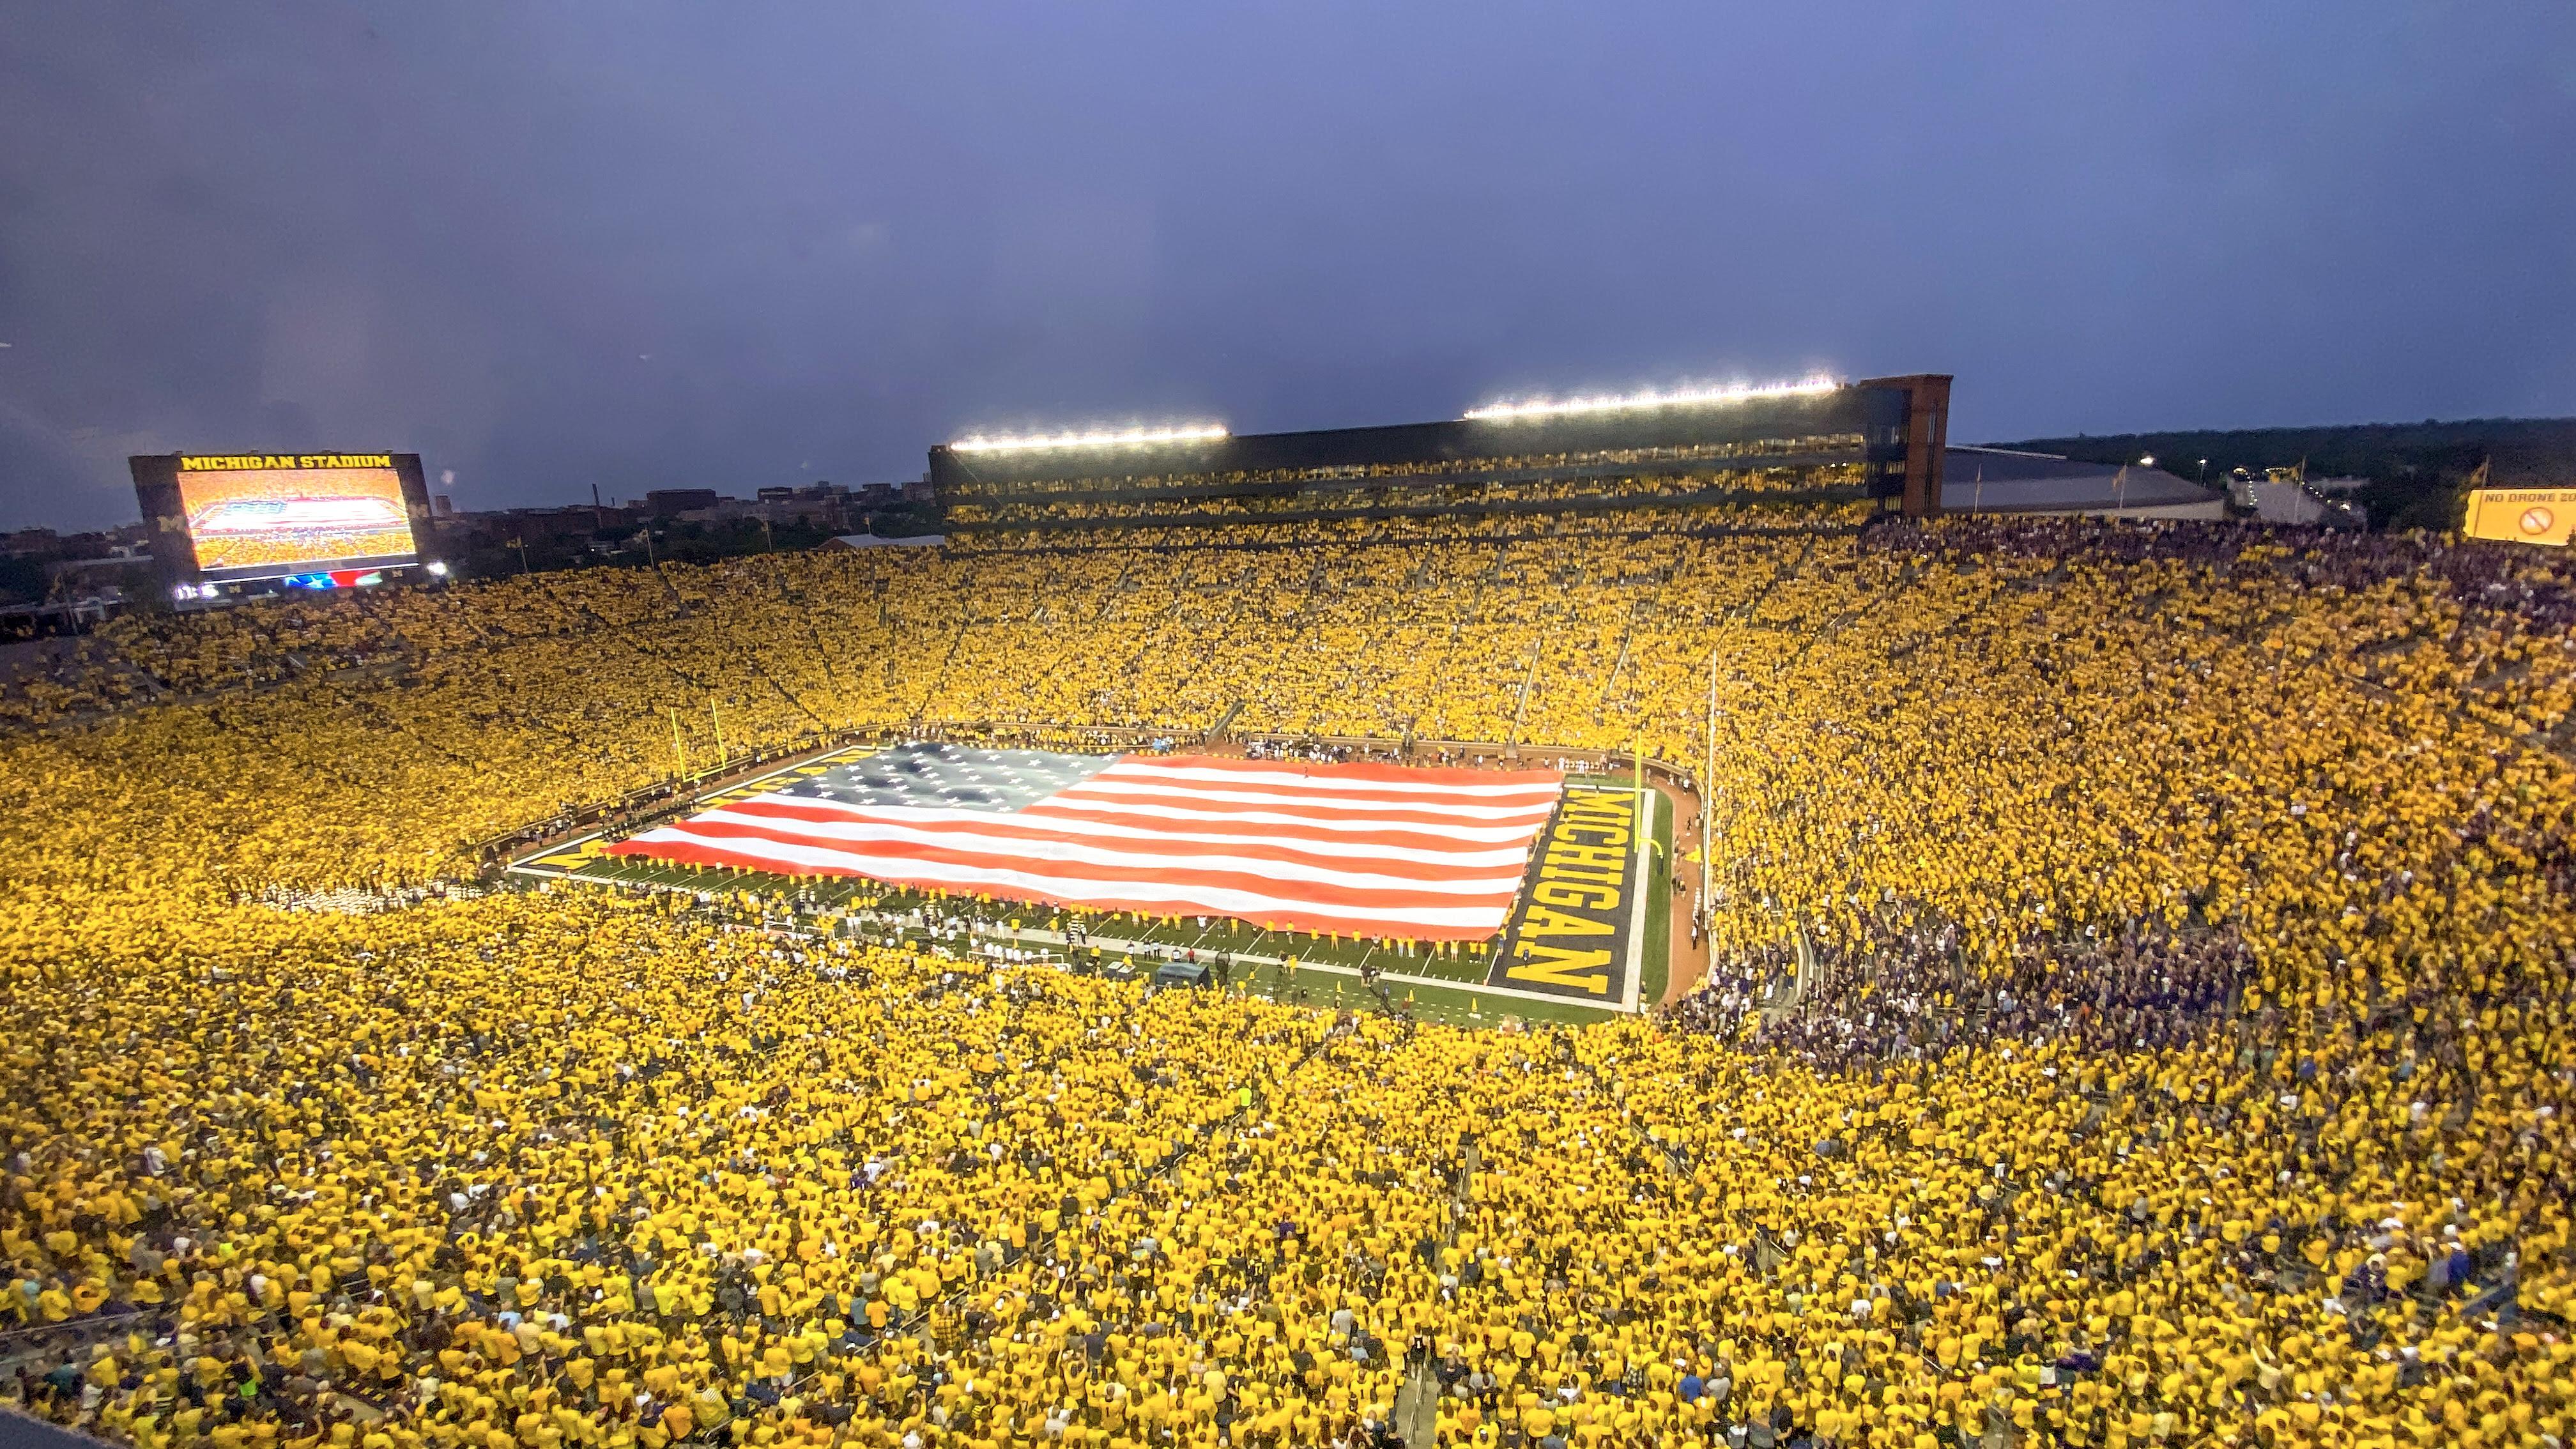 Jim Harbaugh is 'drooling' watching Ohio State vs. Oregon – Paul Finebaum   SportsNation